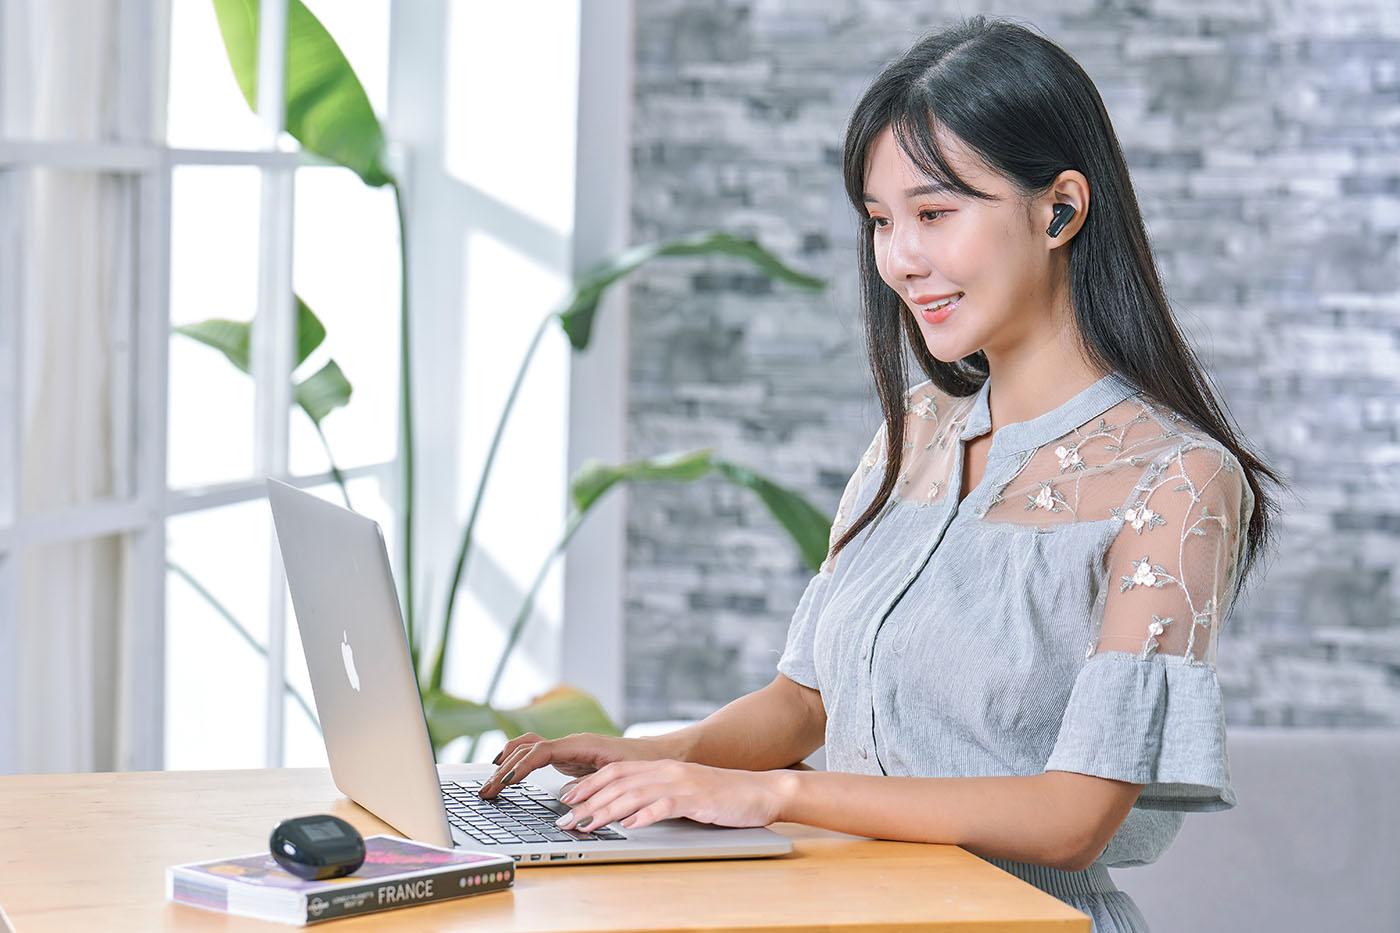 FreeBuds Pro 另一重點功能,就是可以在已經配對/連接的兩種裝置中,輕鬆切換,例如耳機連接電腦聆聽音樂時,手機來電,FreeBuds Pro 就會自動切換到手機端,讓用家可以即刻接聽電話,而當電話掛斷後,耳機則會自動連接回電腦,繼續音樂播放聆聽功能,整個切換過程流暢之外,反應速度也很快,重點是這不僅限於Android、Windows,也能支援iOS。